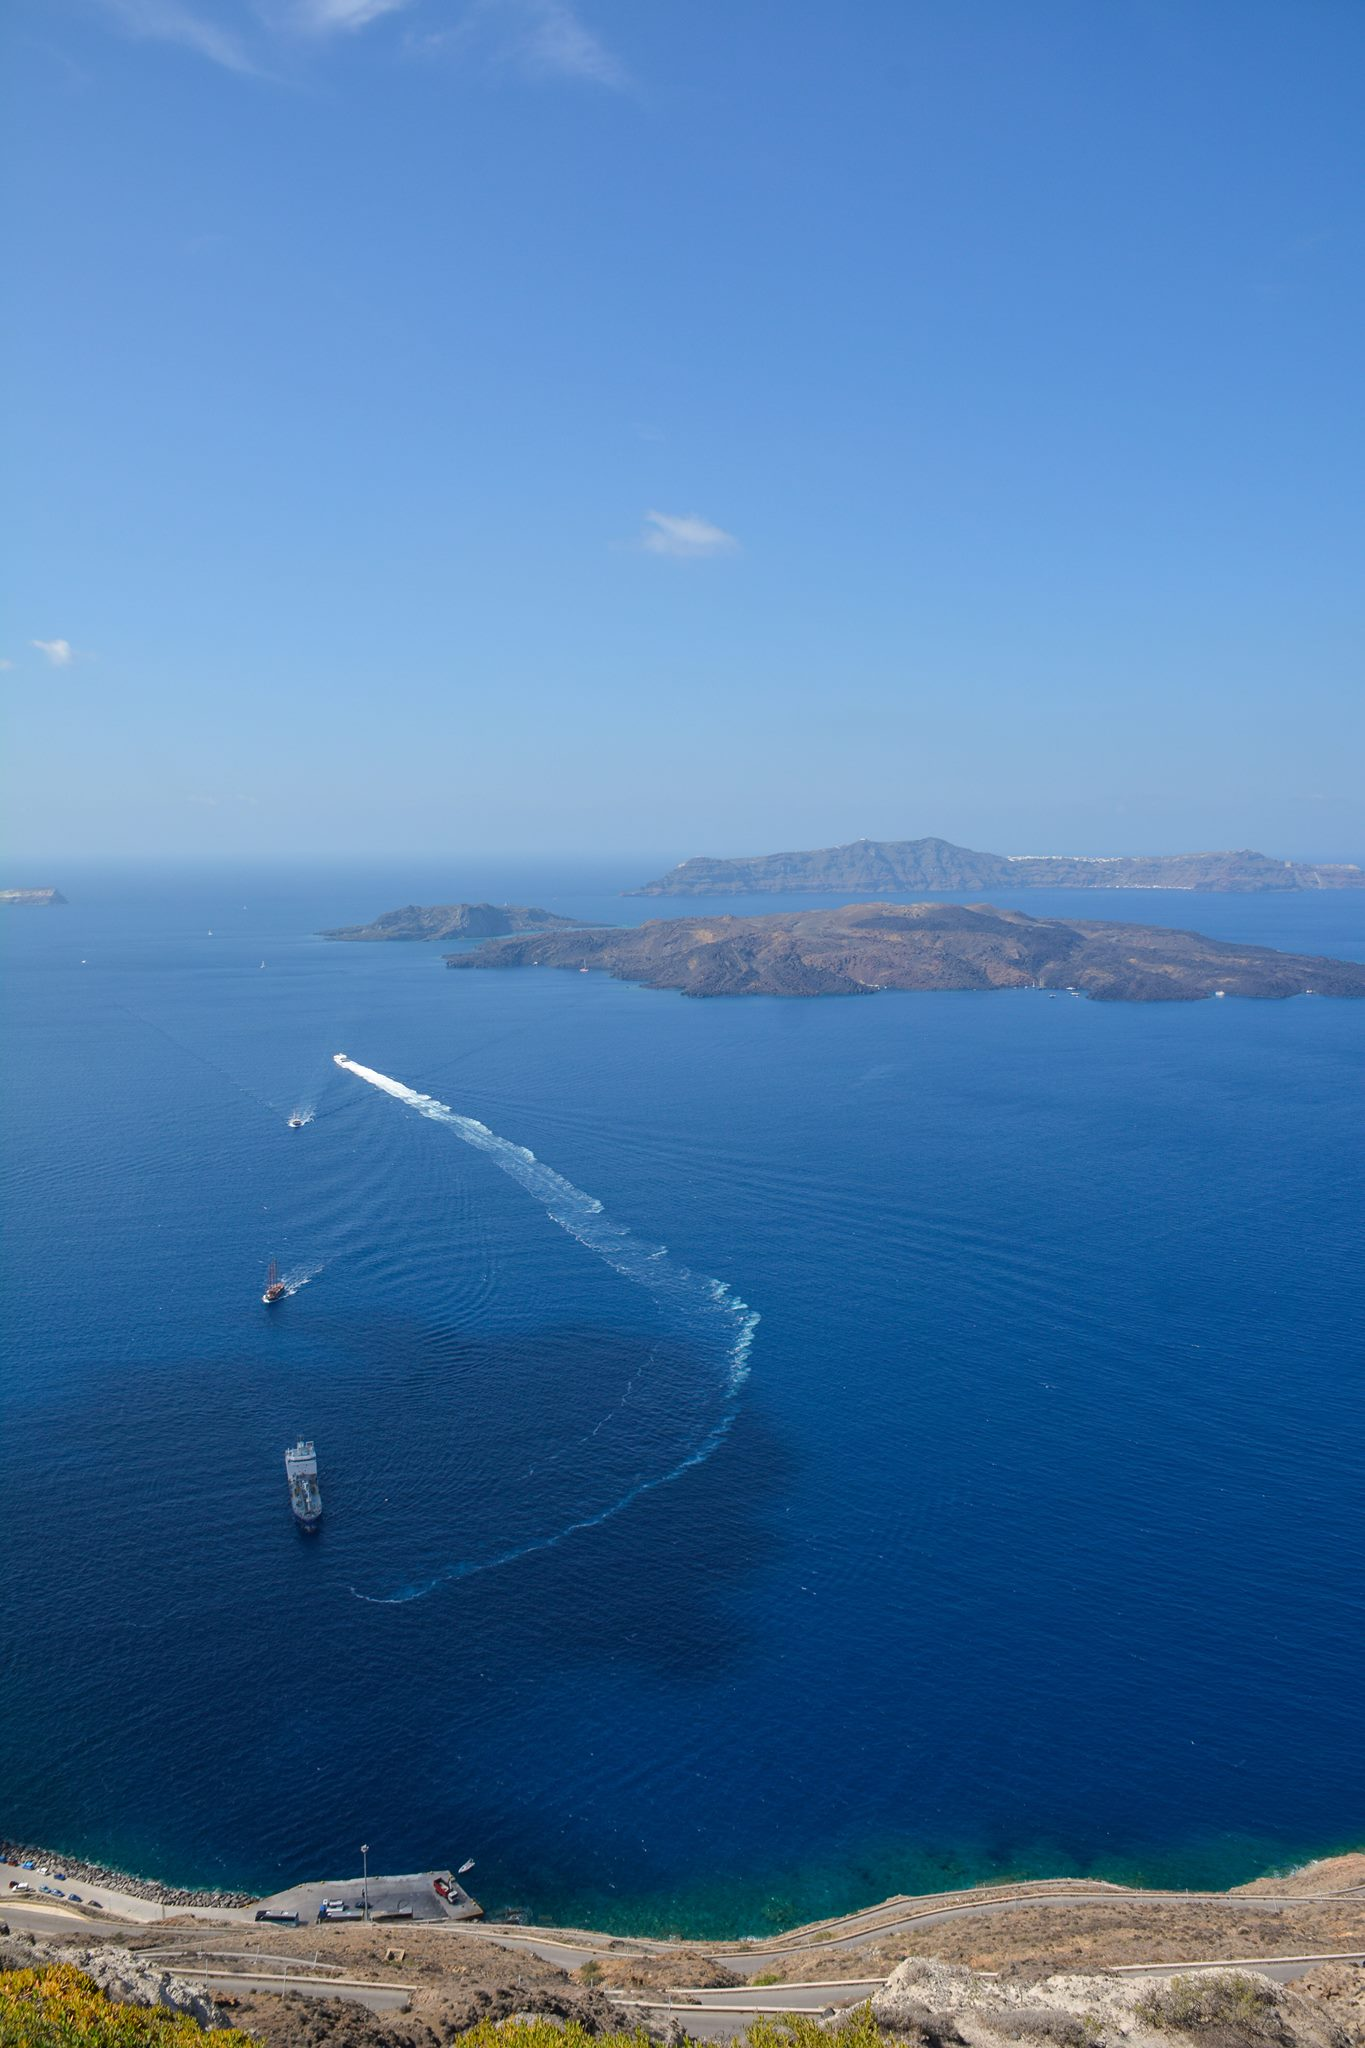 Santorini: A Photo Diary by Chris (8)